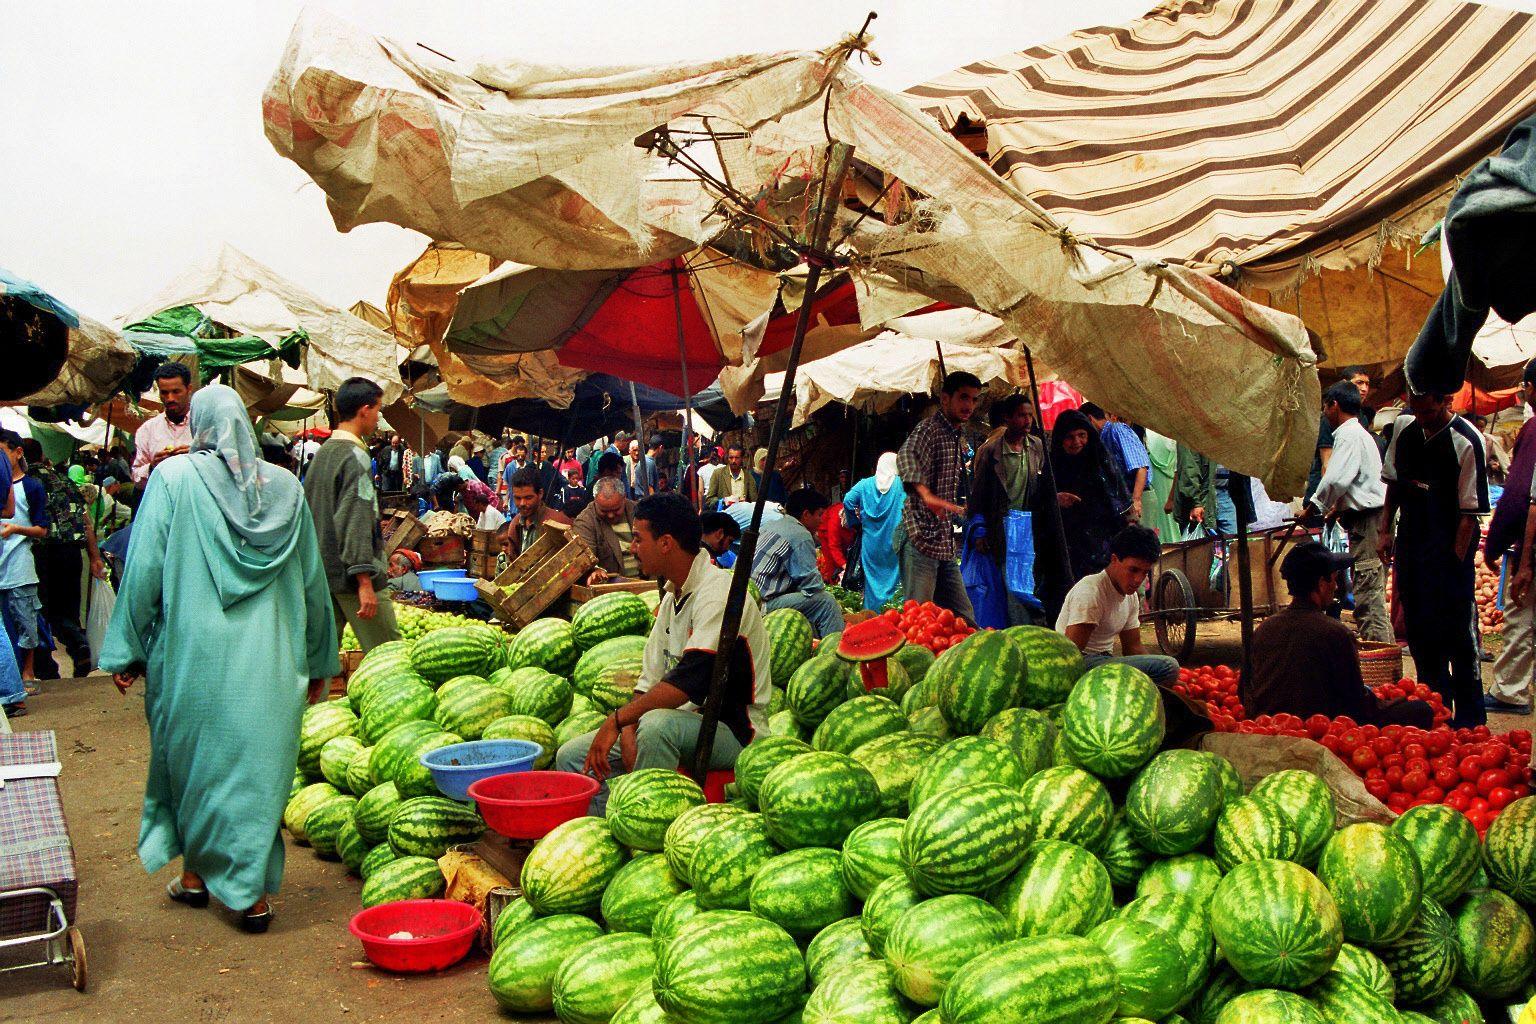 Marokko, 2002, souk